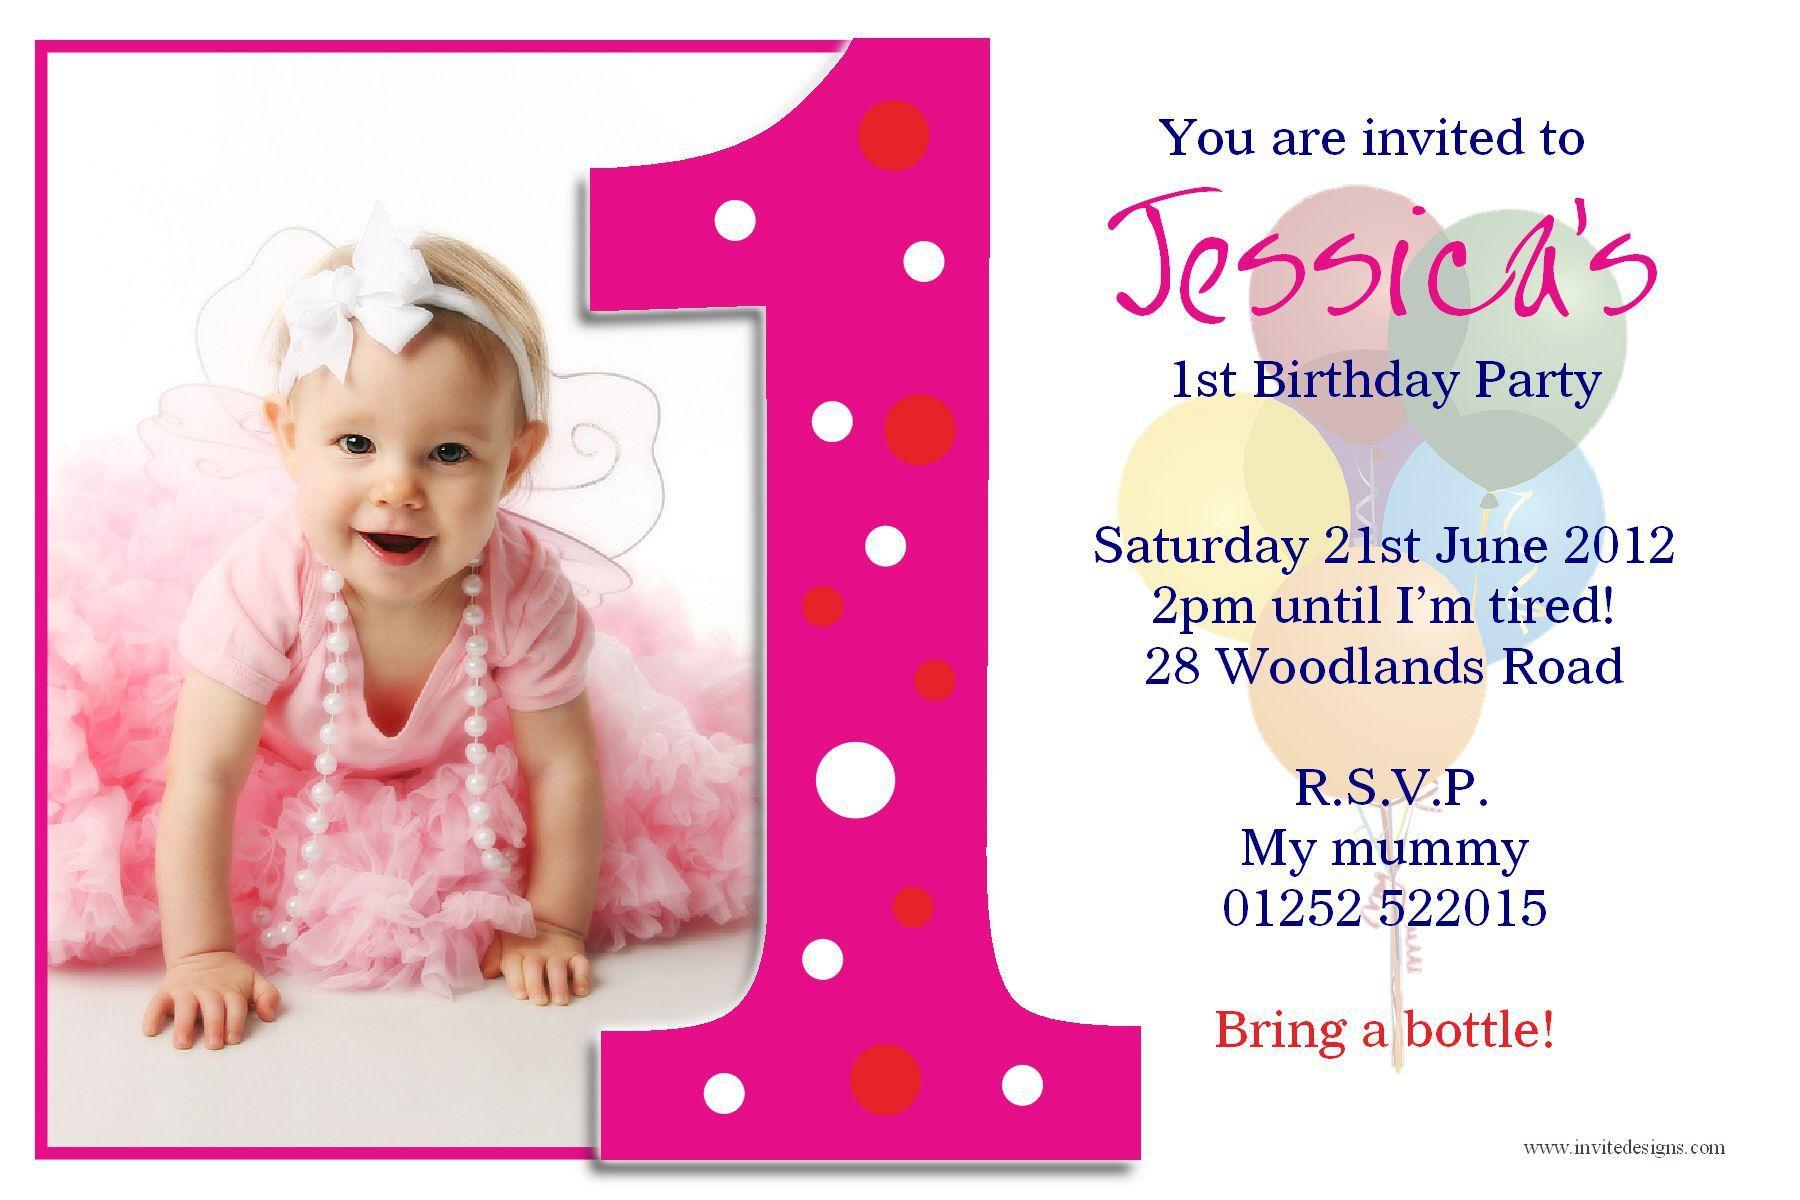 Birthday Invitation Cards India 1st Birthday Invitations Girl Photo Birthday Invitations Birthday Invitation Card Template